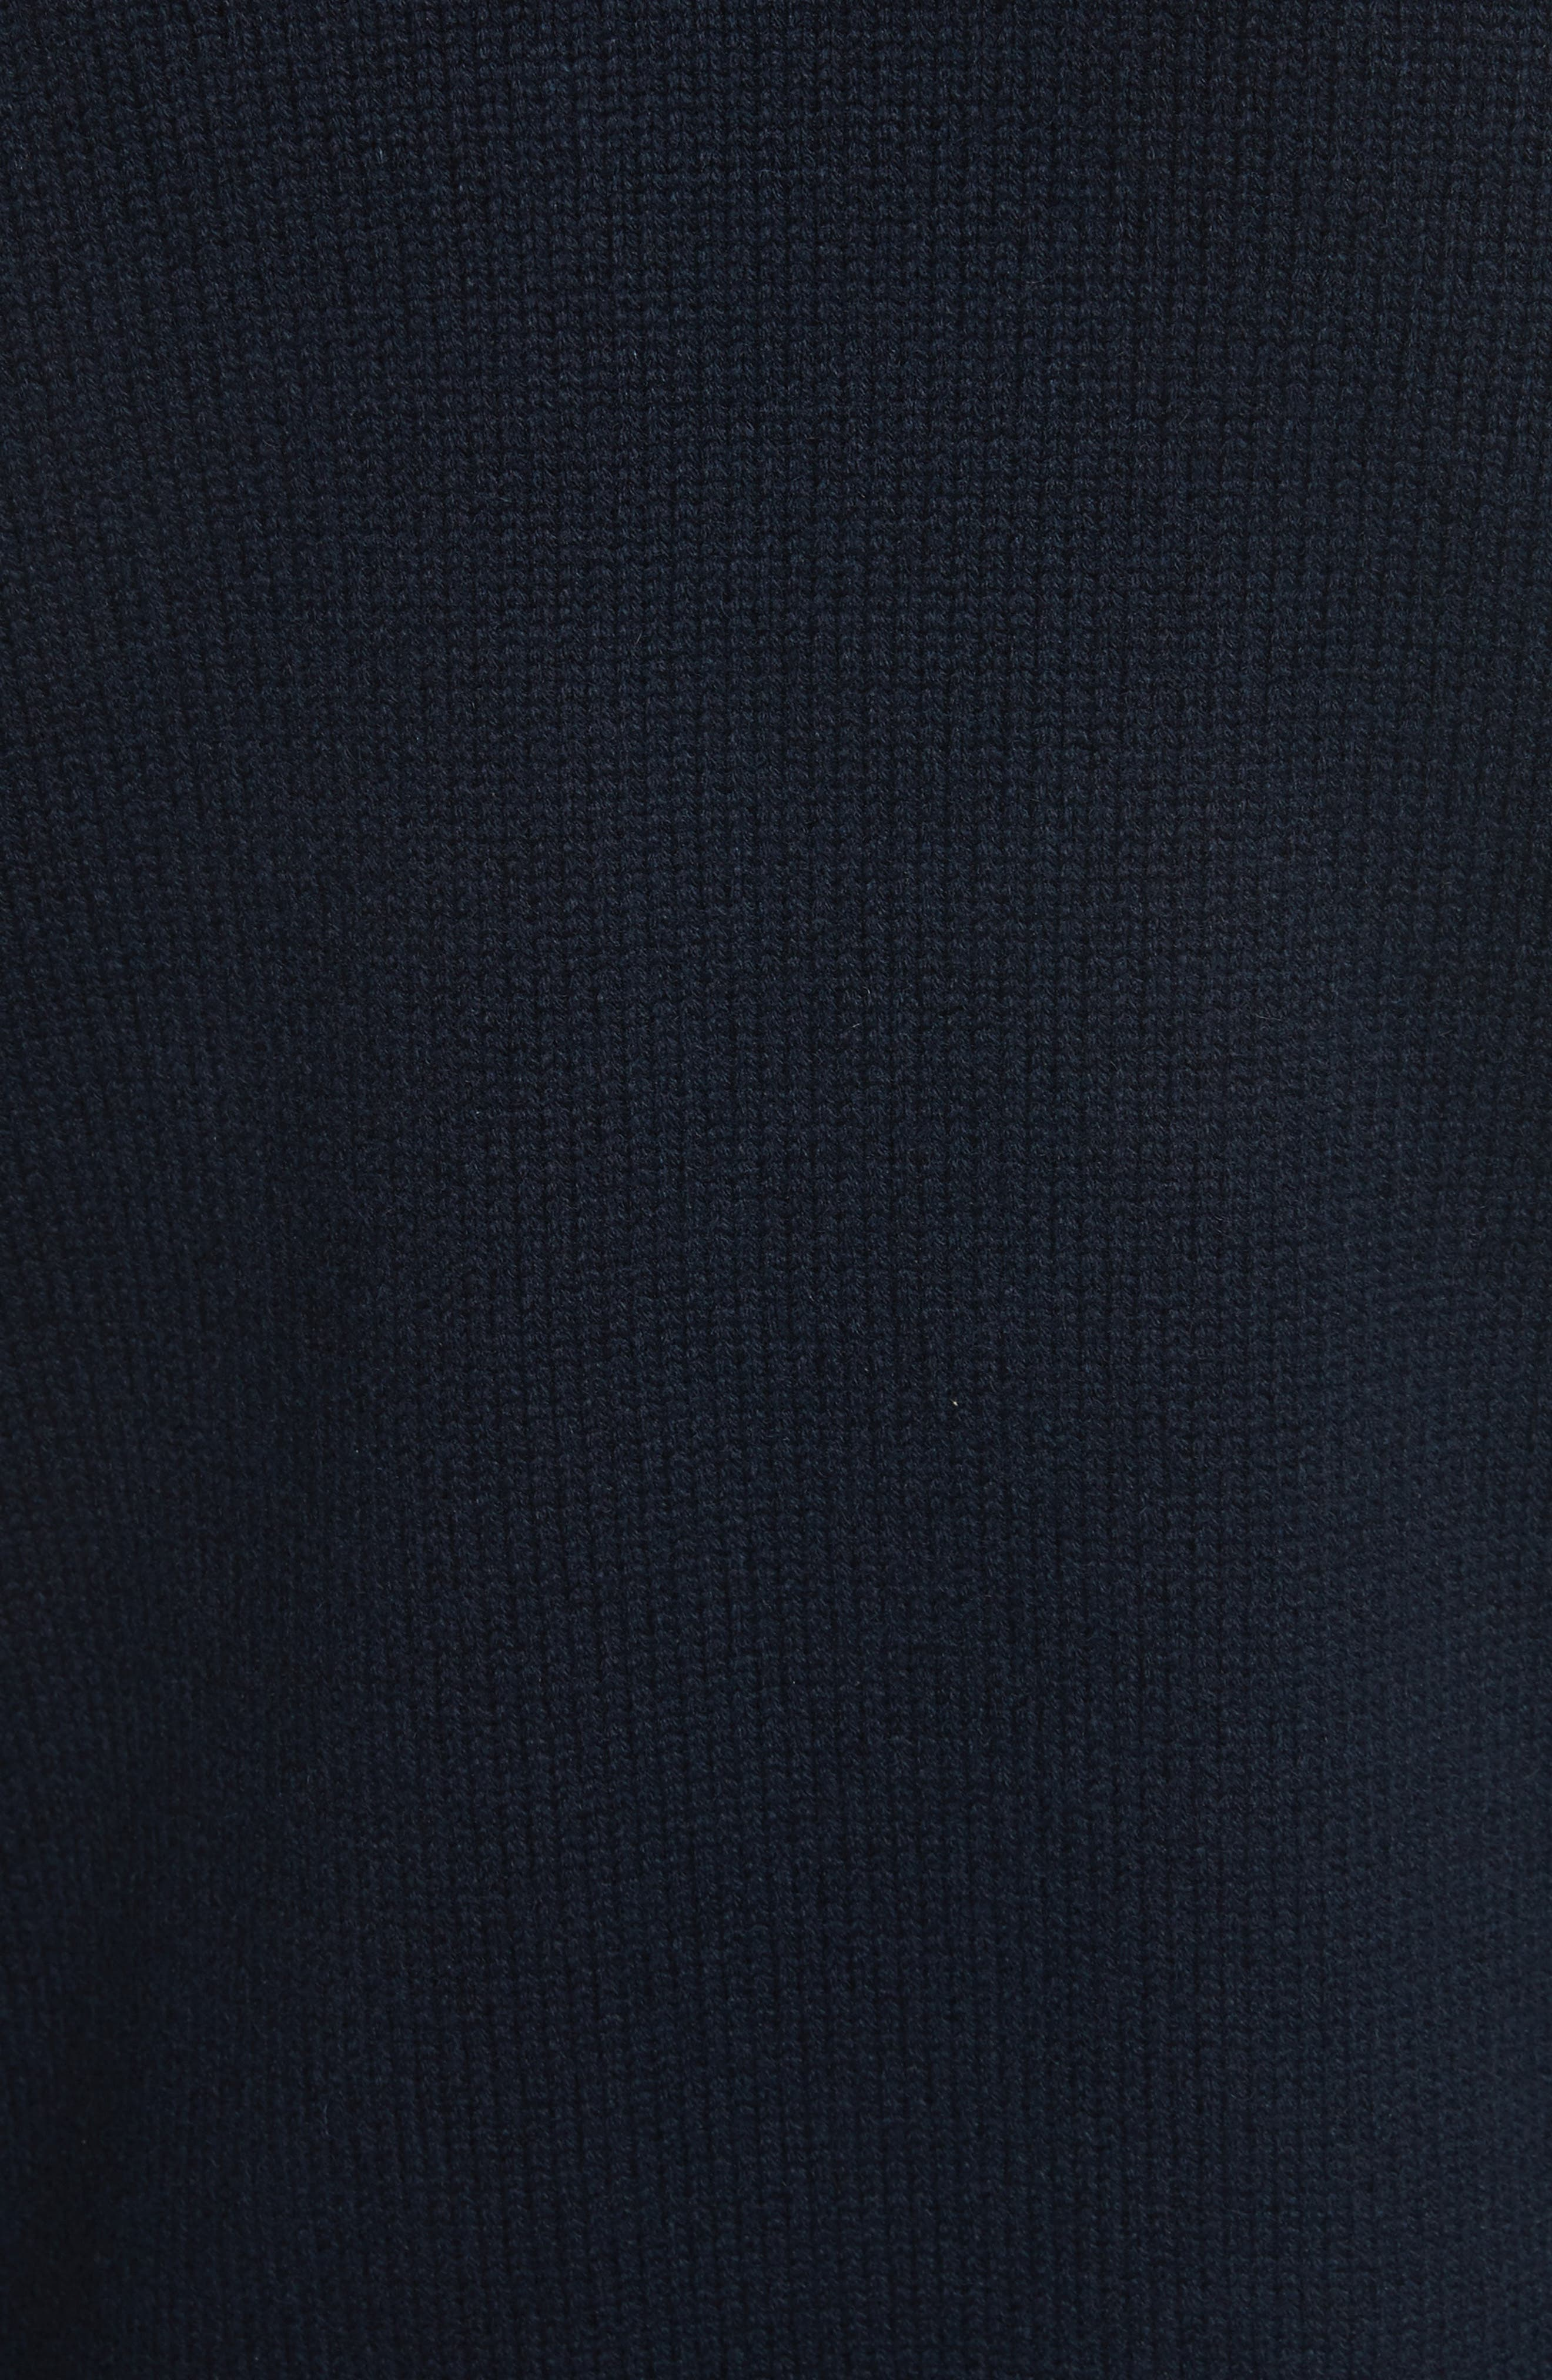 Quilted Velvet & Knit Cardigan,                             Alternate thumbnail 5, color,                             Navy